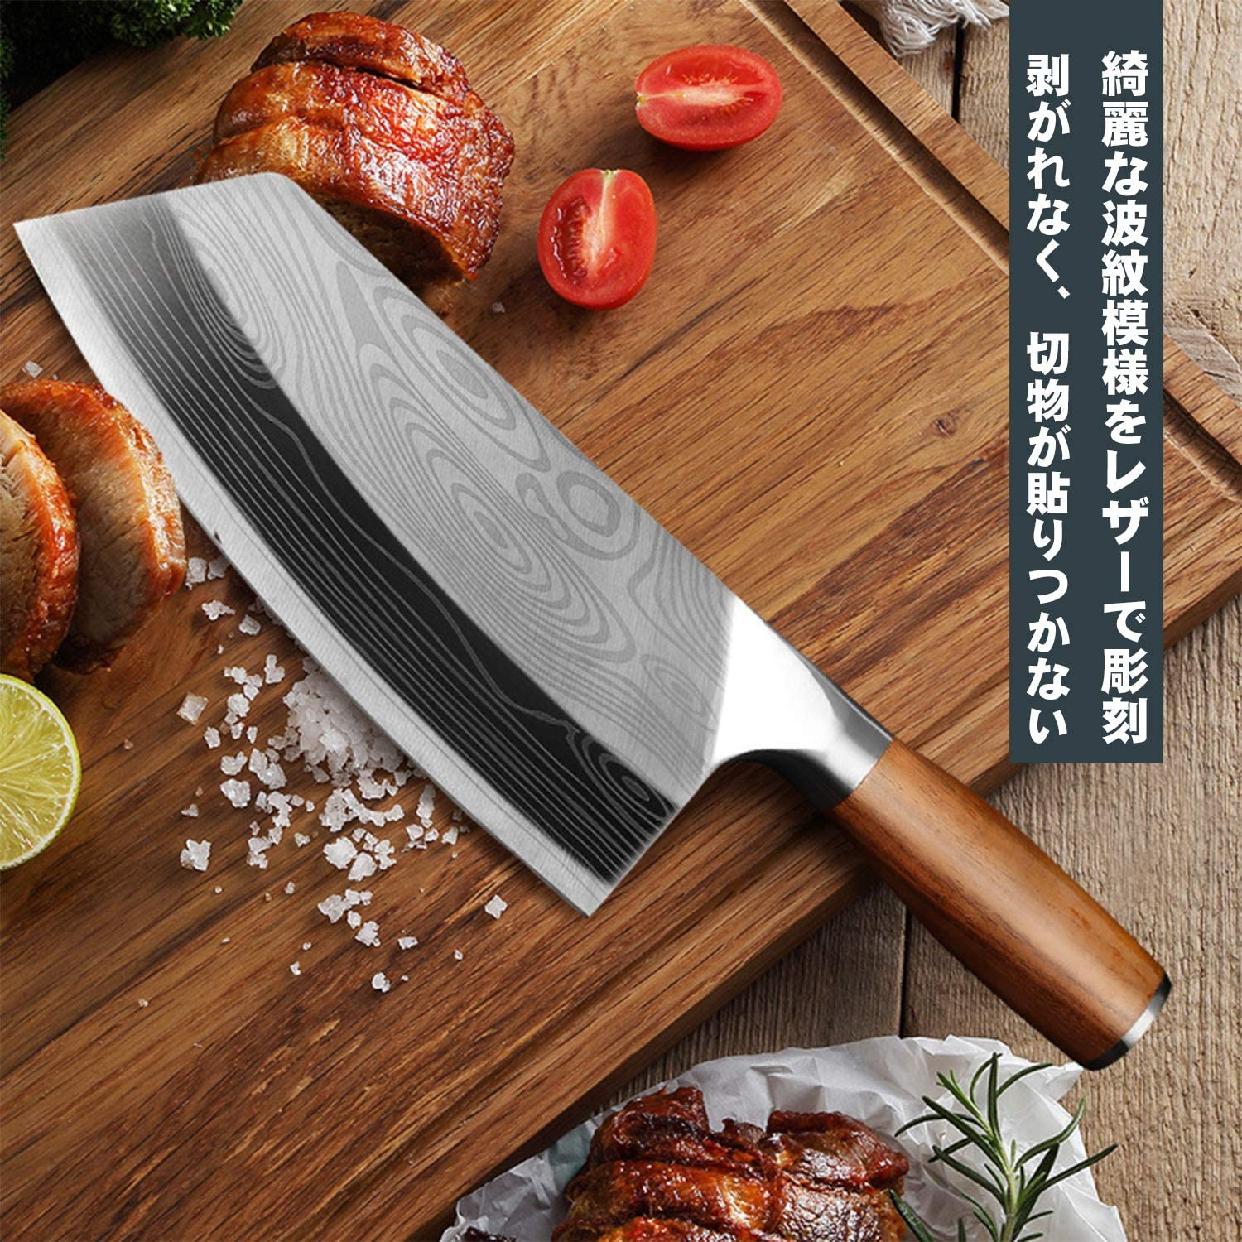 MUKAI(ムカイ) ステンレス キッチンナイフ 20cmの商品画像2